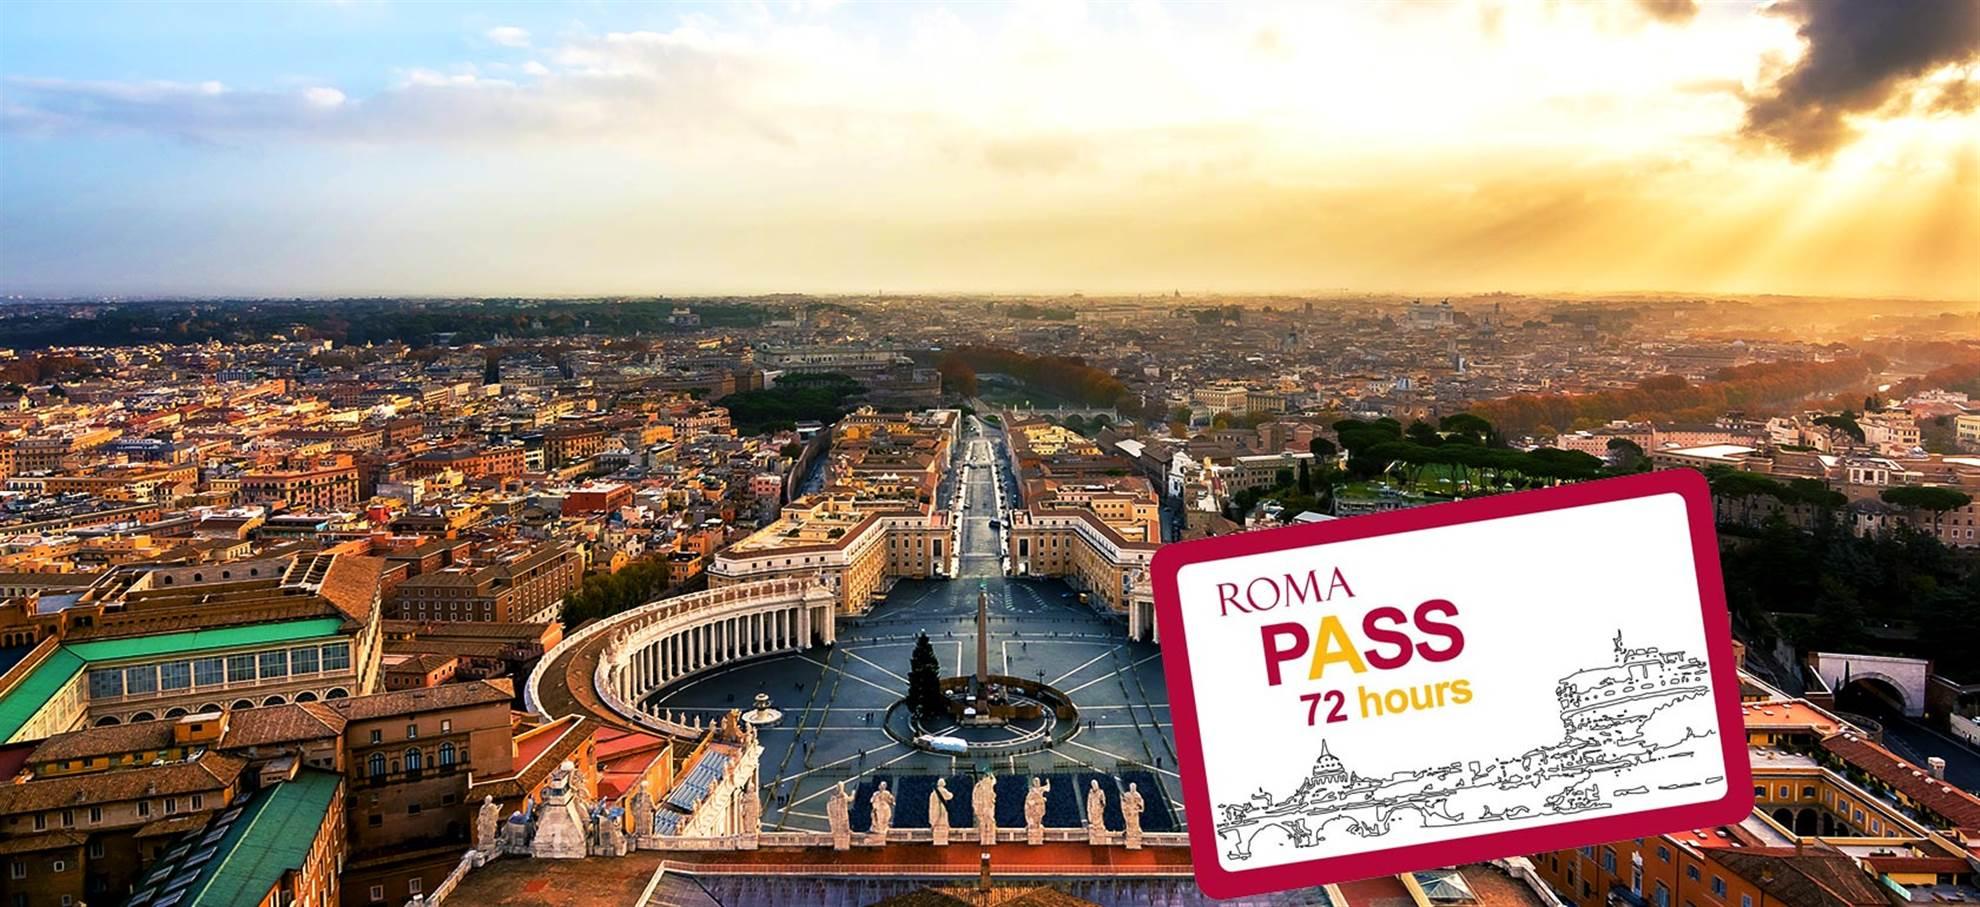 Roma Pass für 72 Stunden (wahlfrei: Basilika St. Peter)